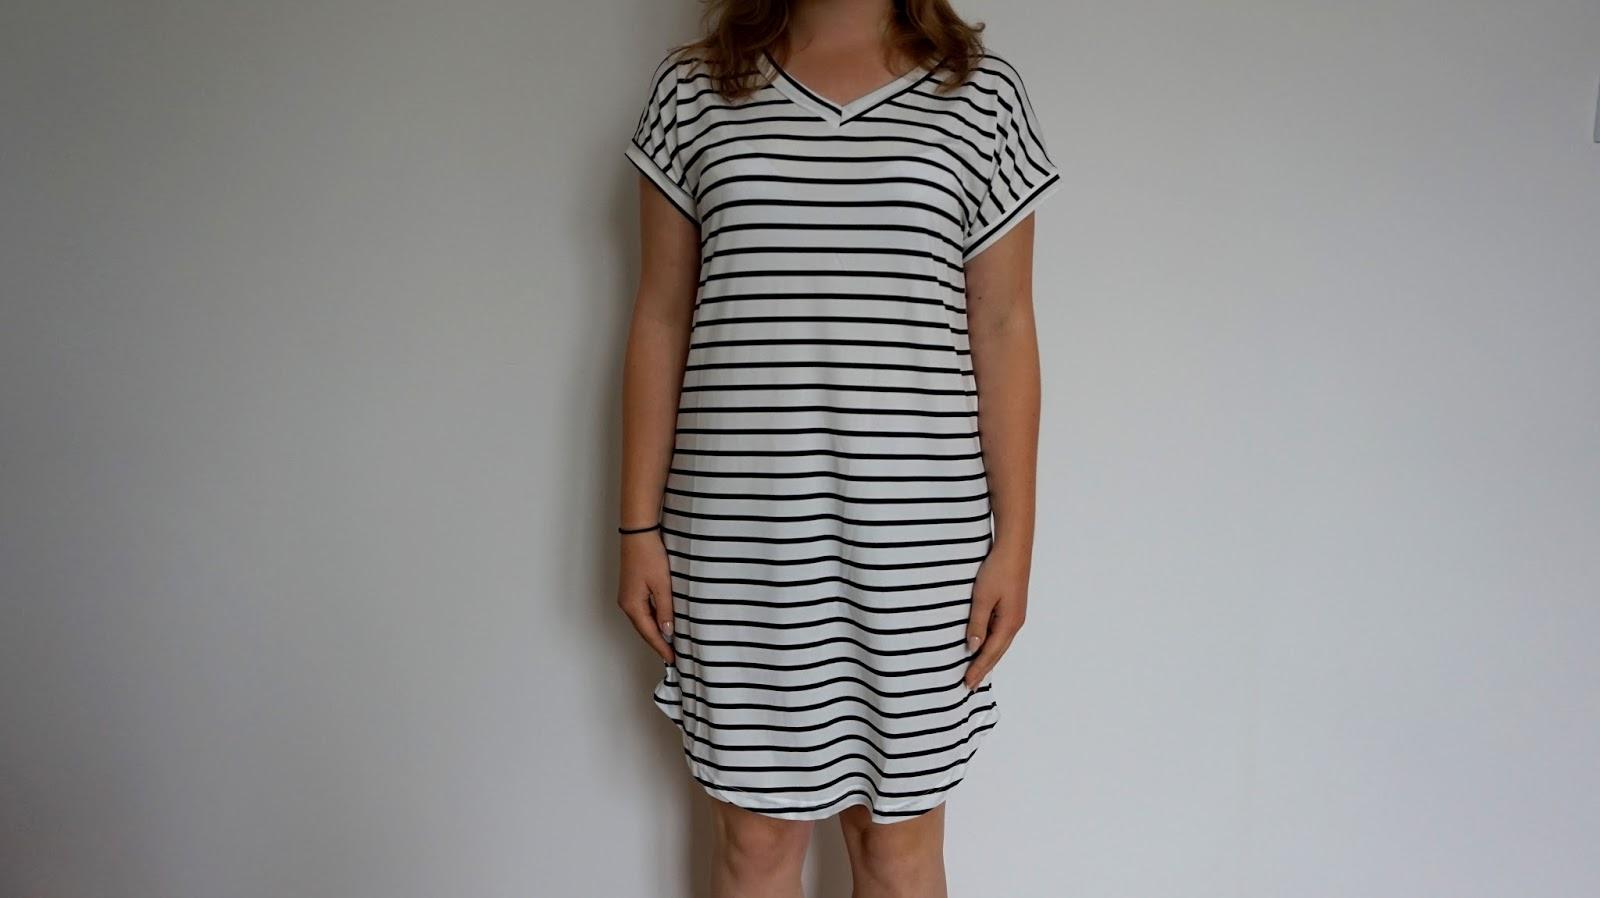 1fdade4d4e RECENZJA  Letnia sukienka w paski